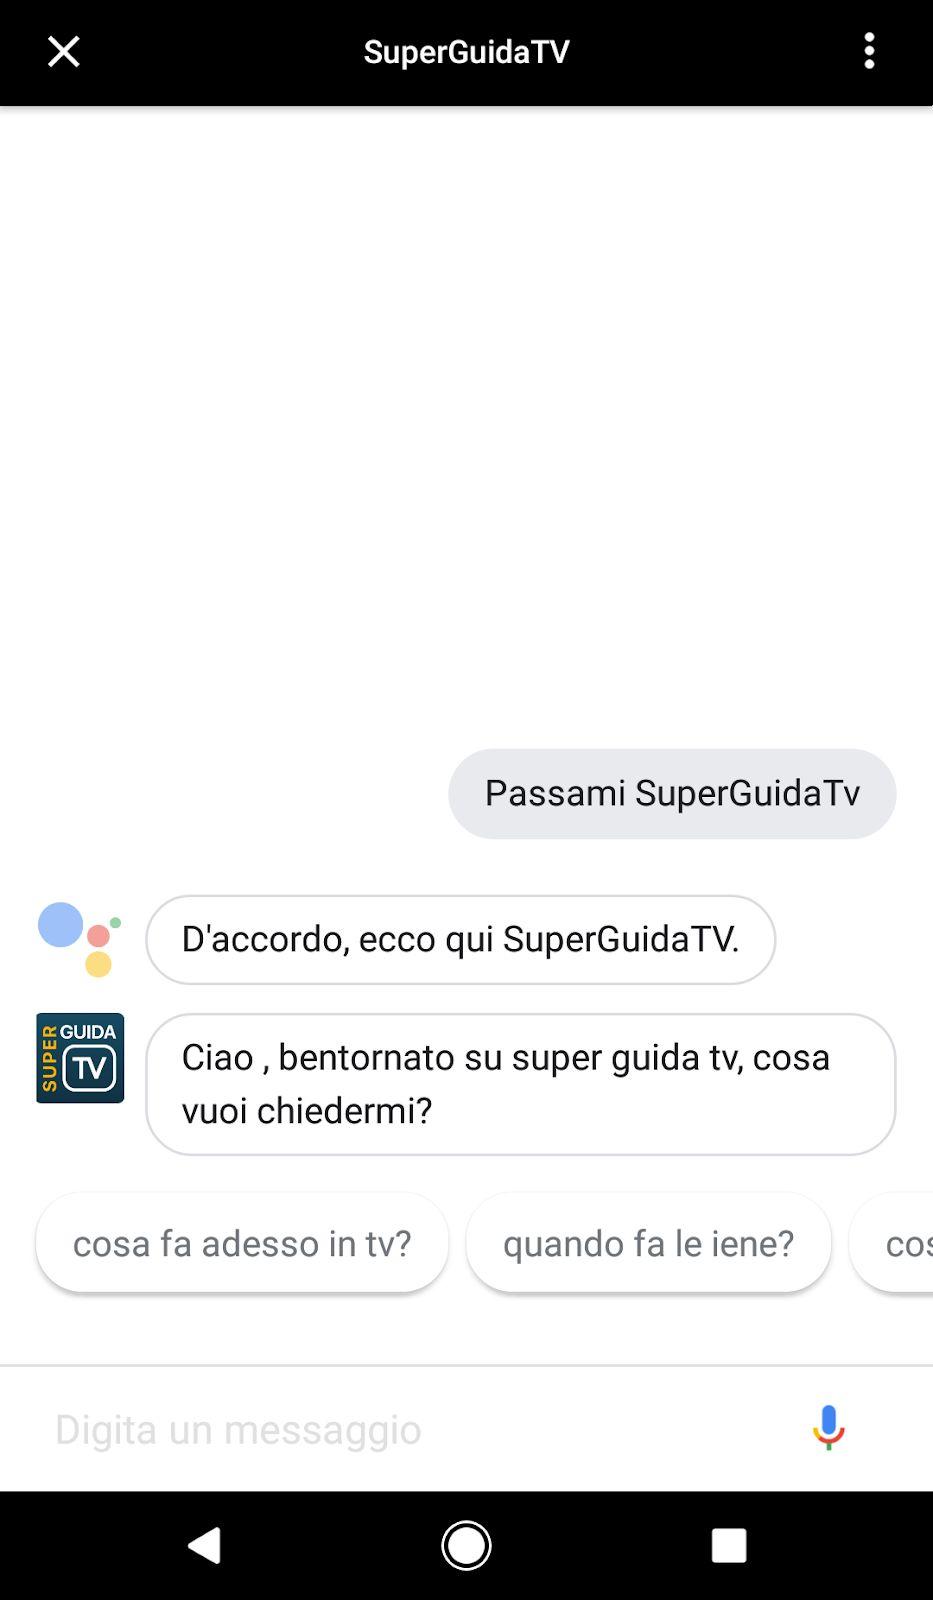 Passami SuperGuidaTv